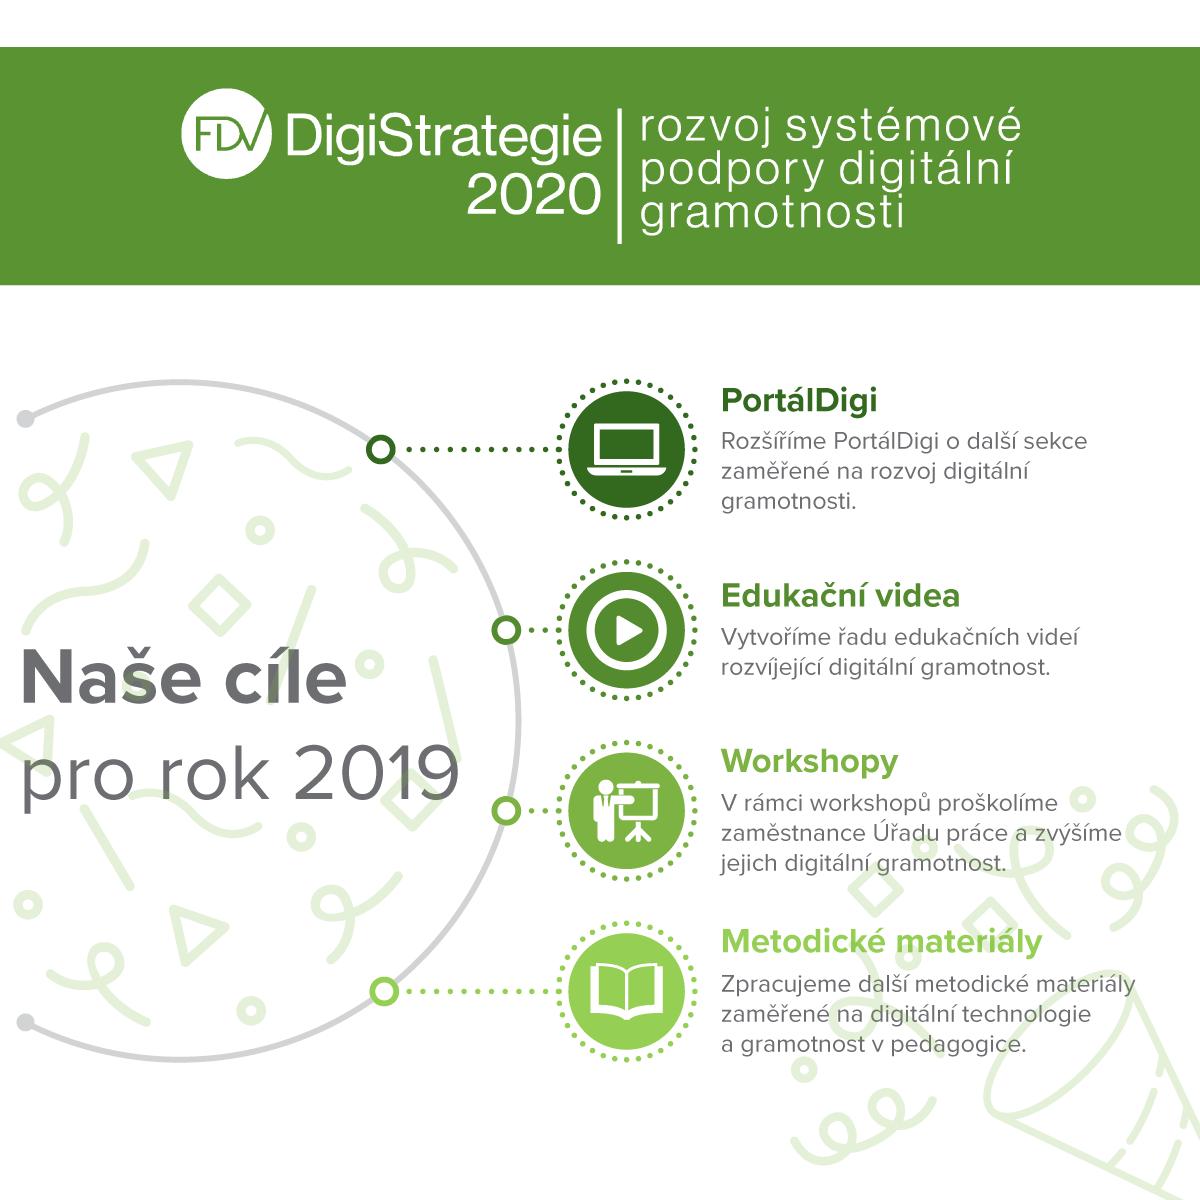 Cile-pro-2019-DigiStrategie.png